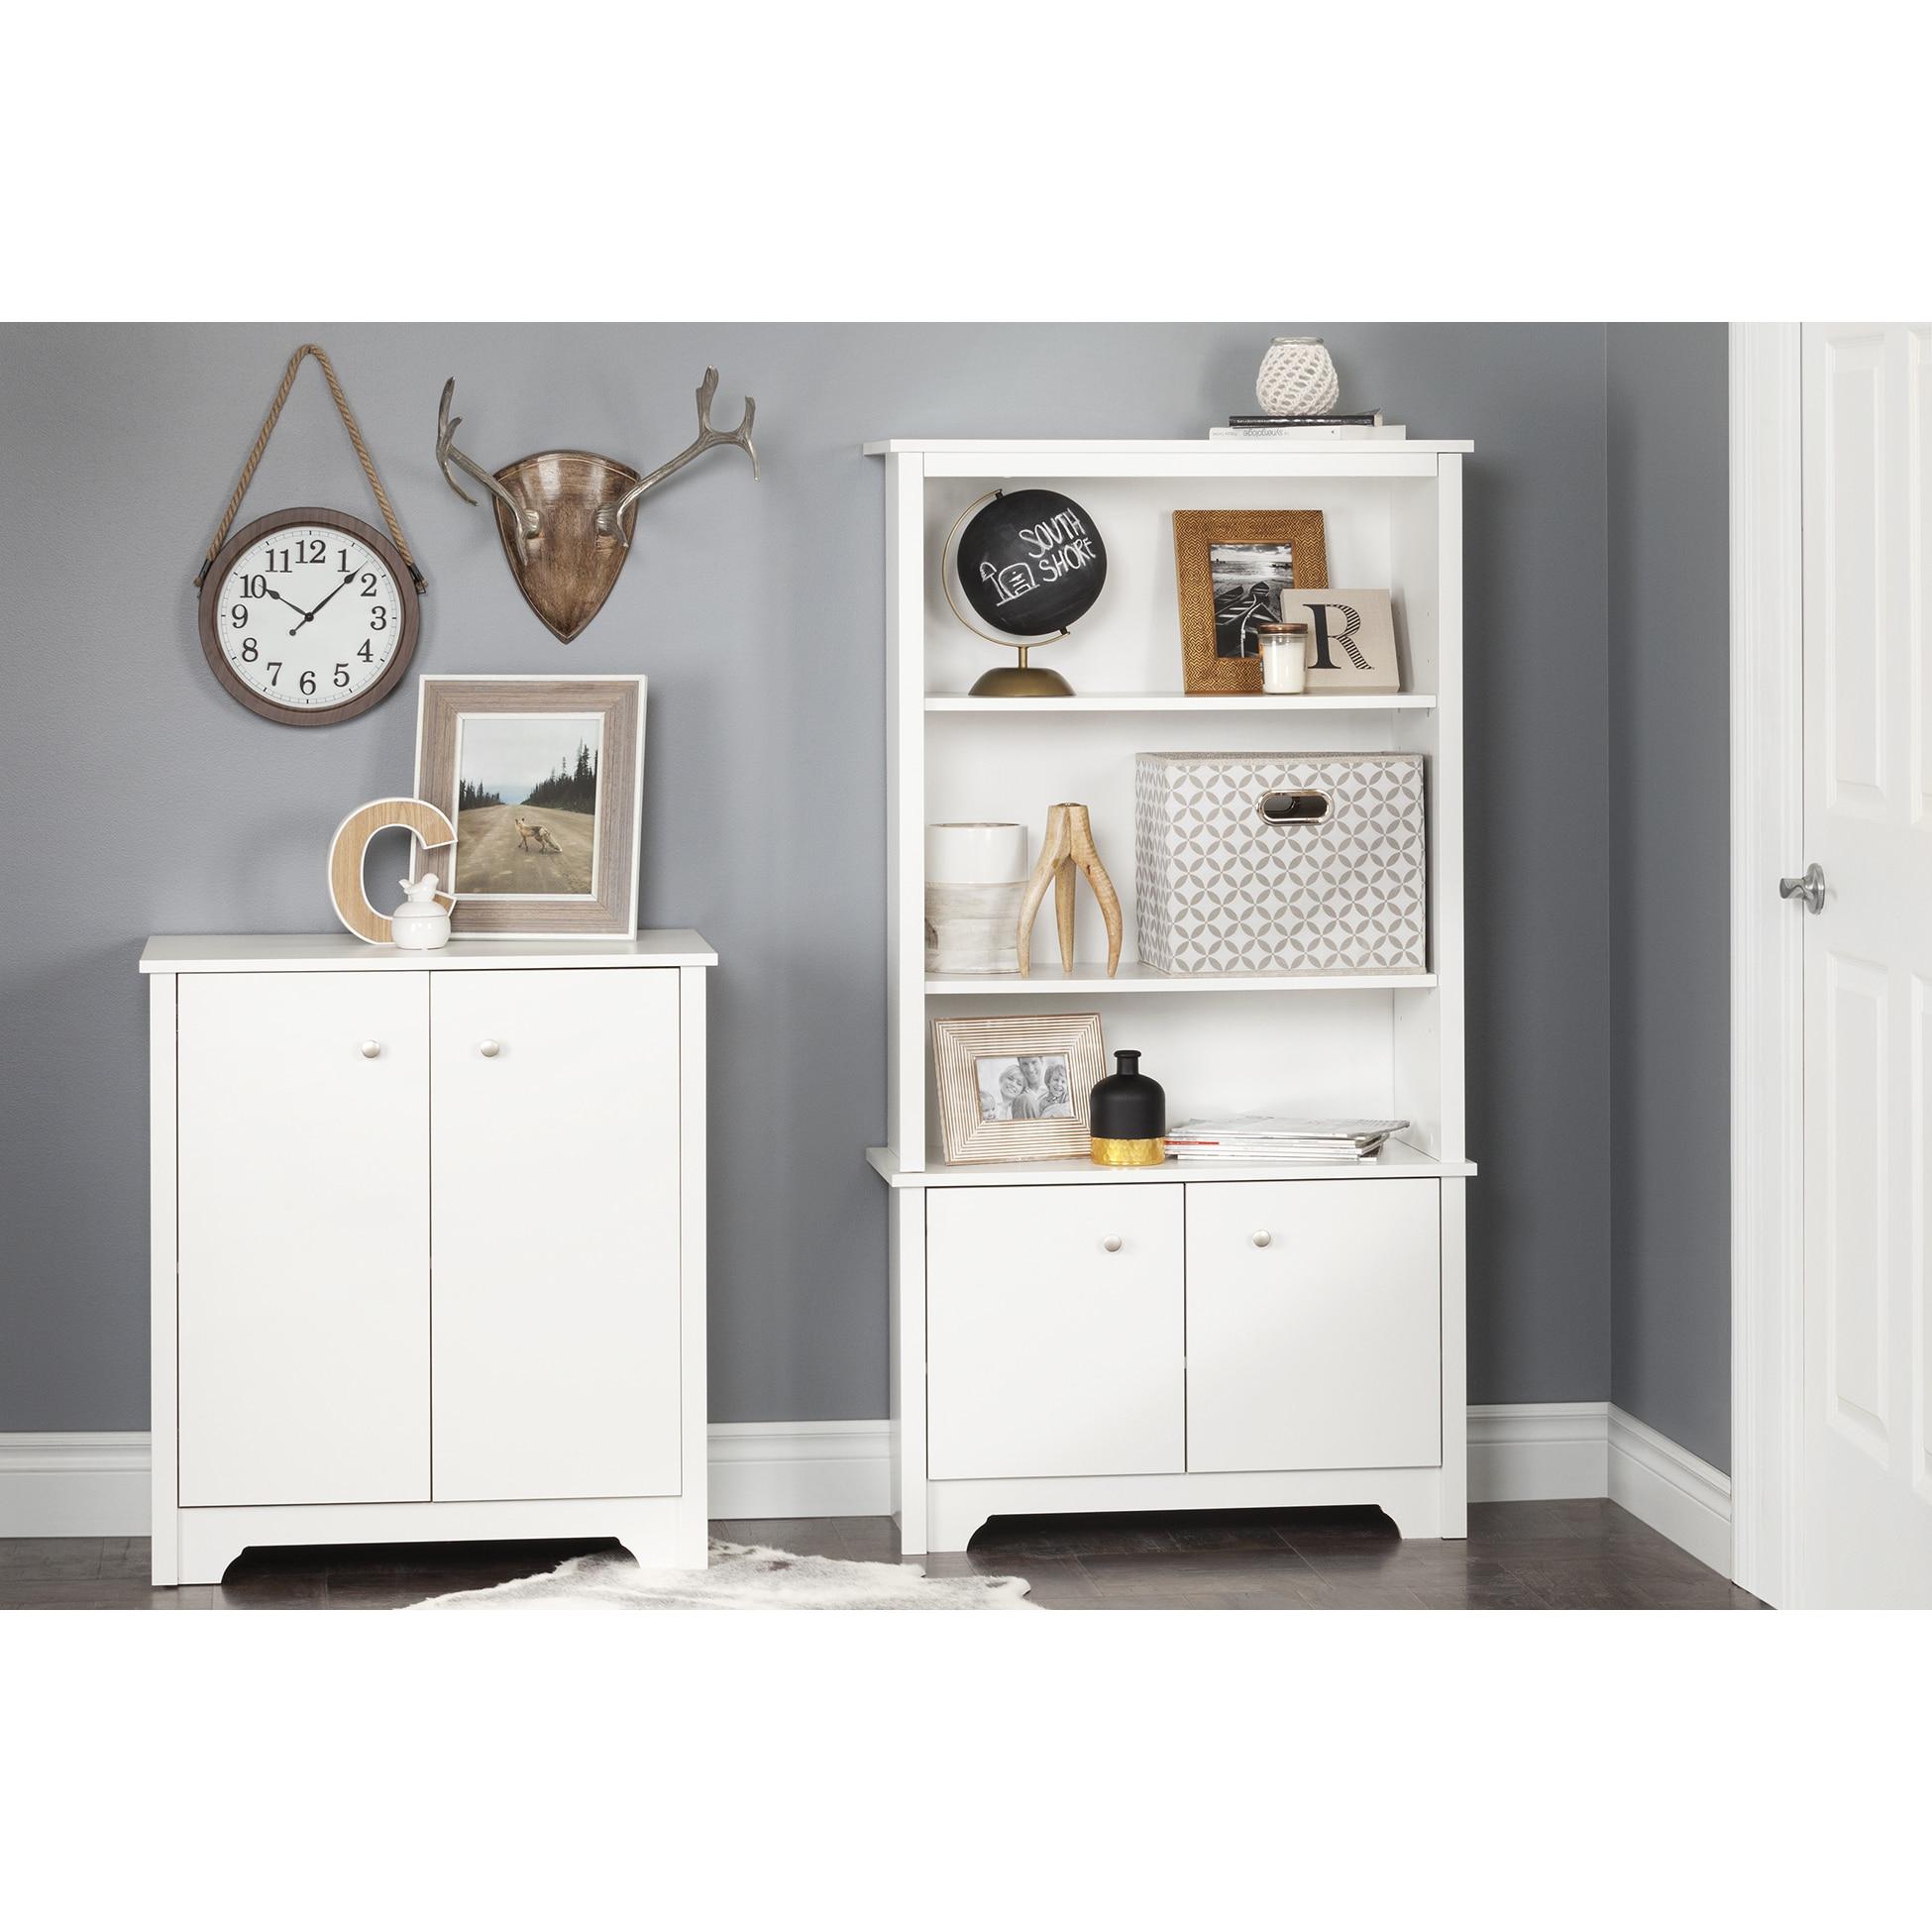 Shop South Shore Vito Small White 2 Door Storage Cabinet Free